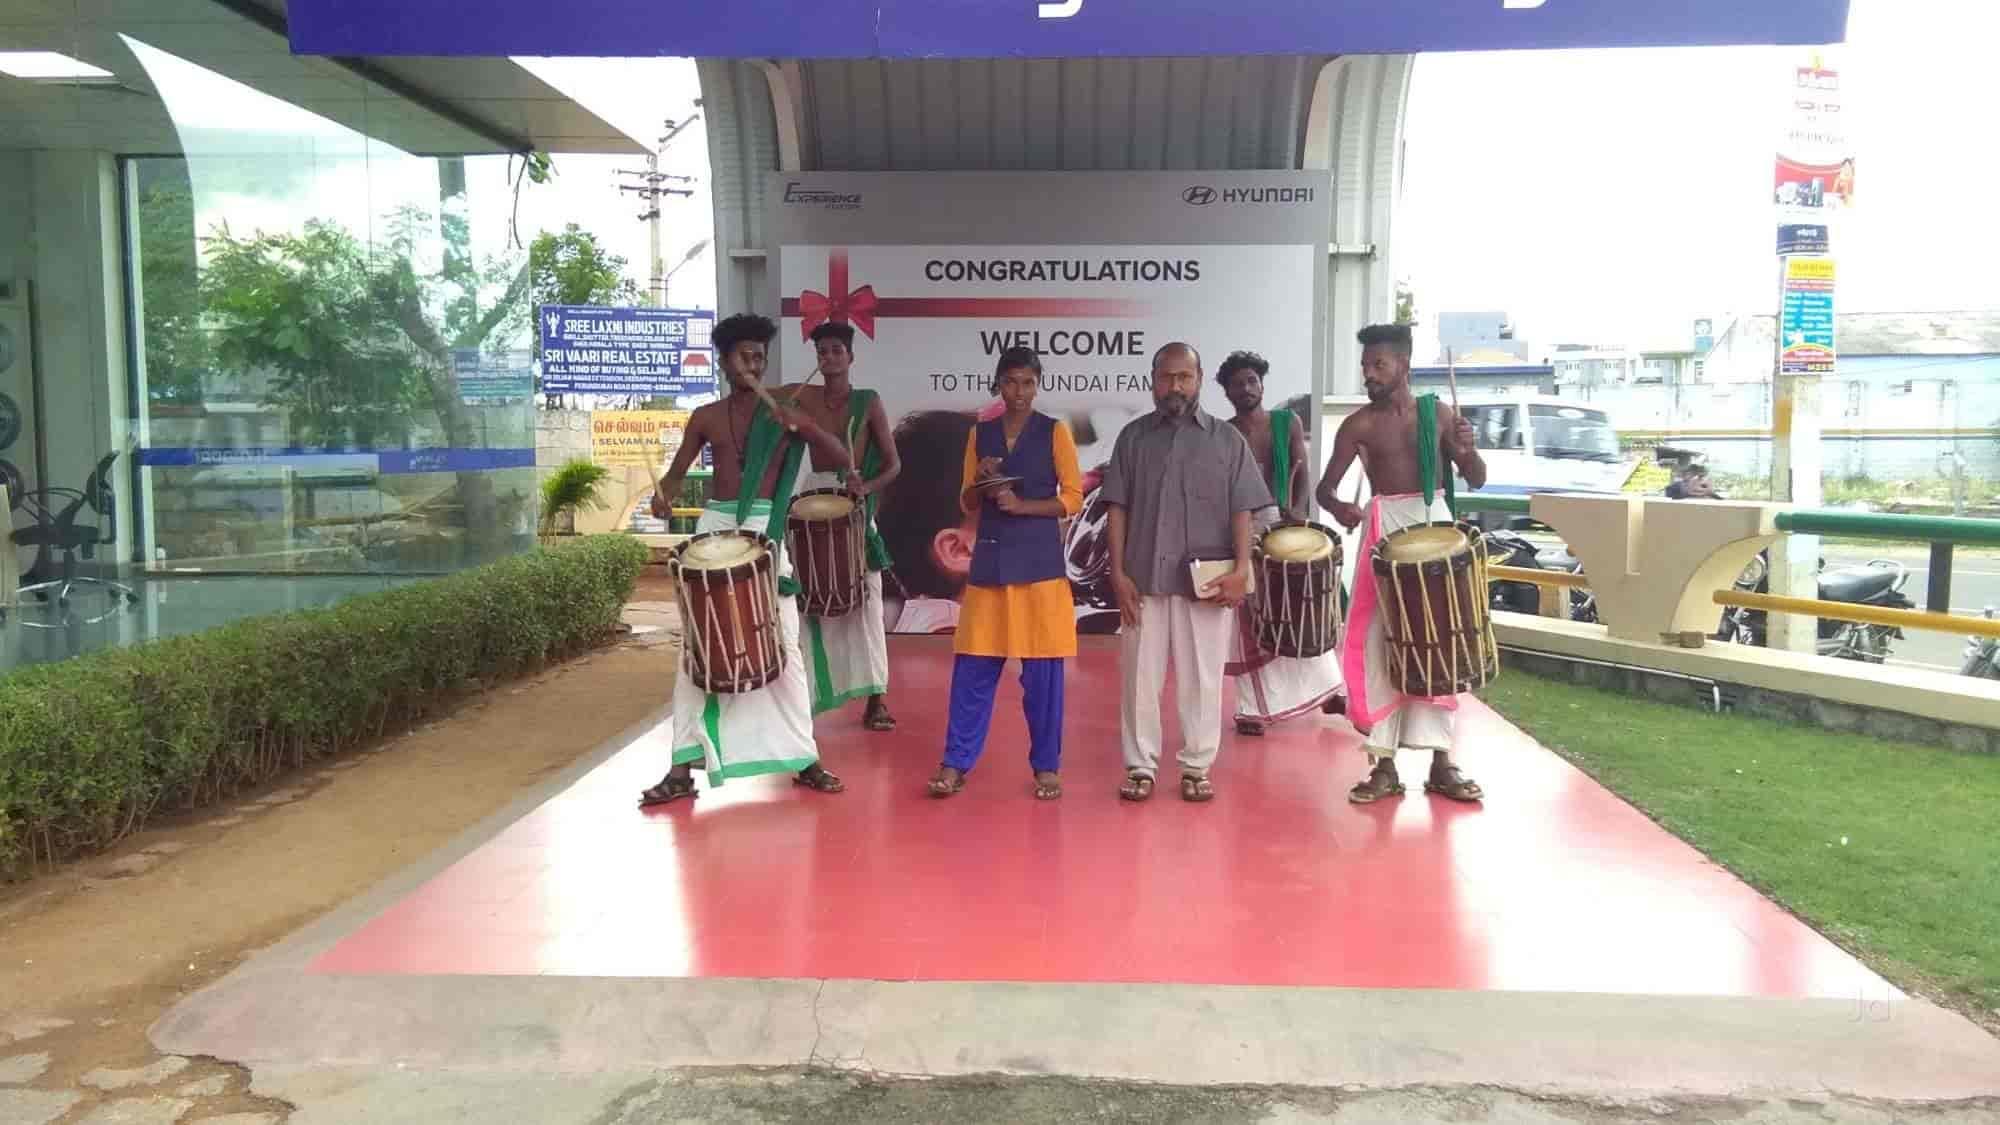 Sri Karpagarani Kerala Chenda Melam And A To Z Wedding Planners Photos Sangliandapuram Trichy